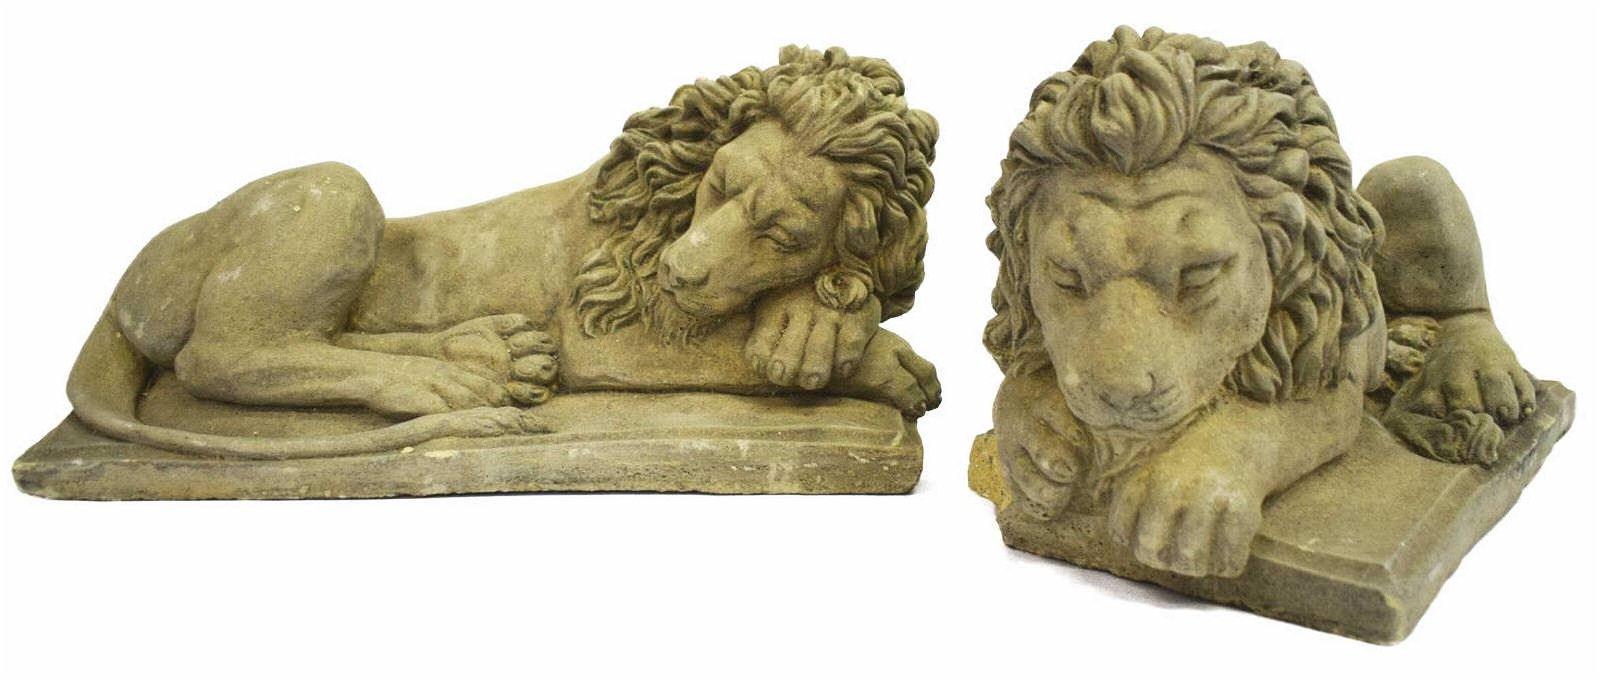 (2) GARDEN STATUARY CAST STONE RECUMBENT LIONS